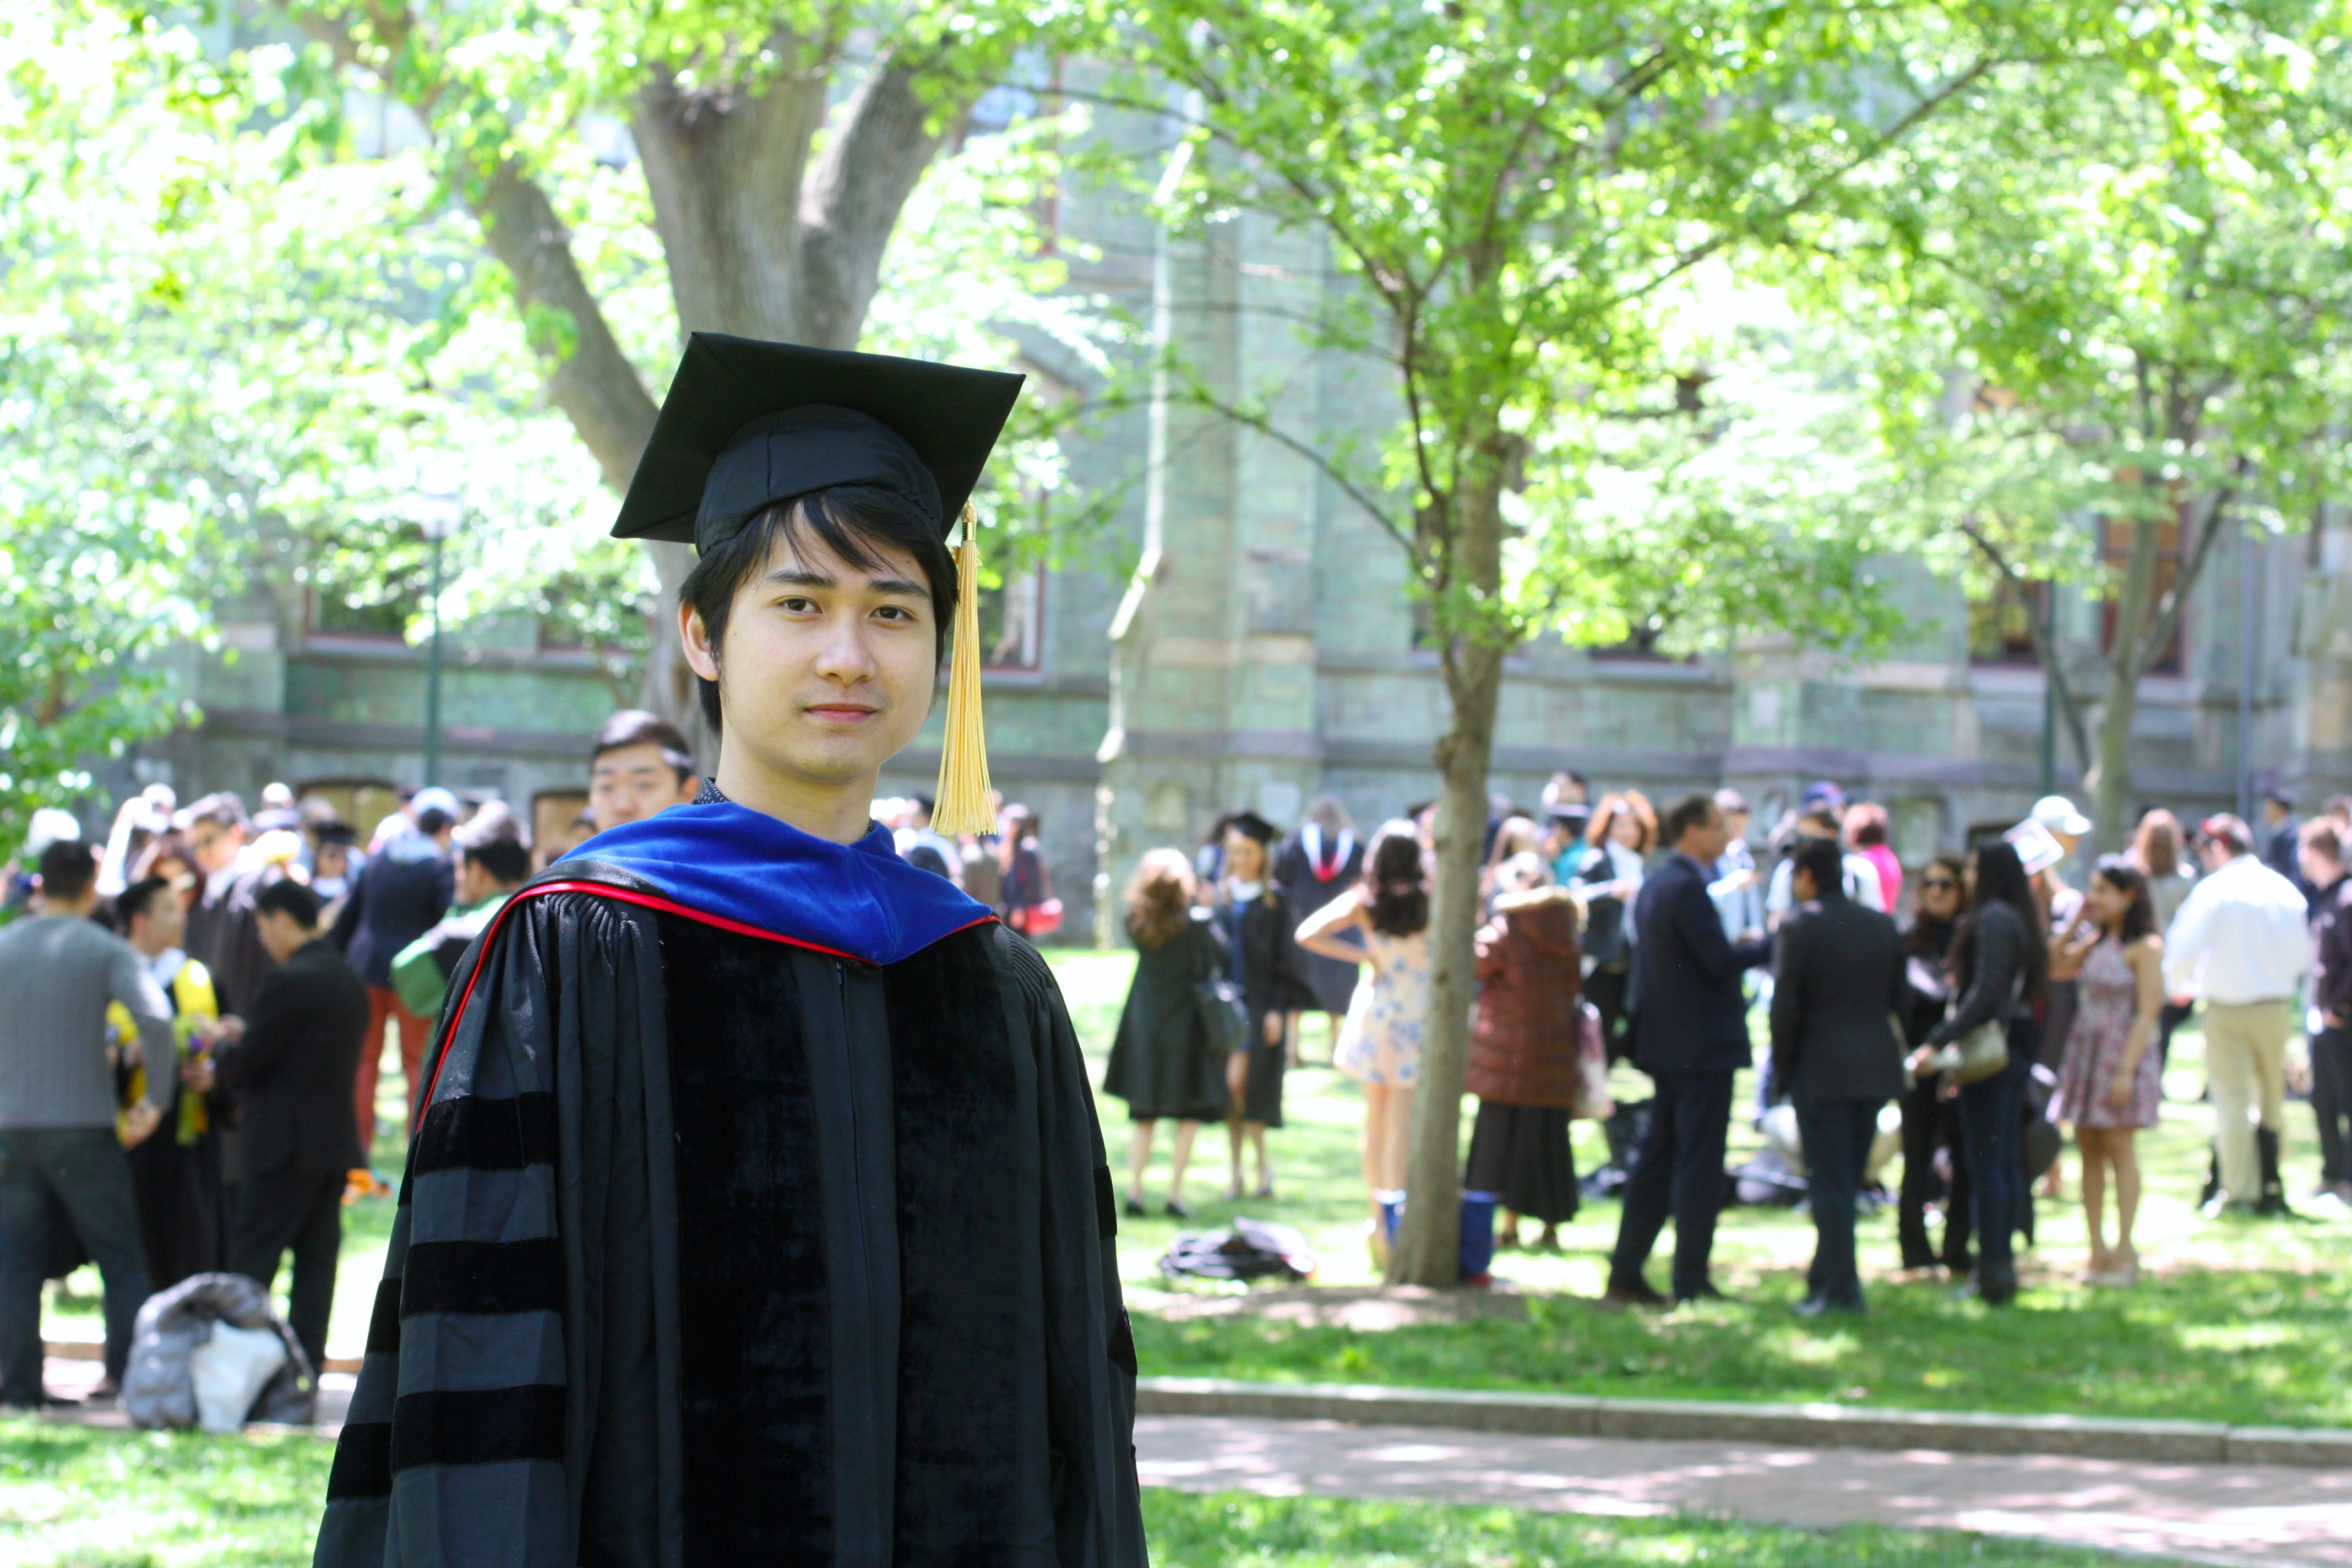 phD Graduation at Penn